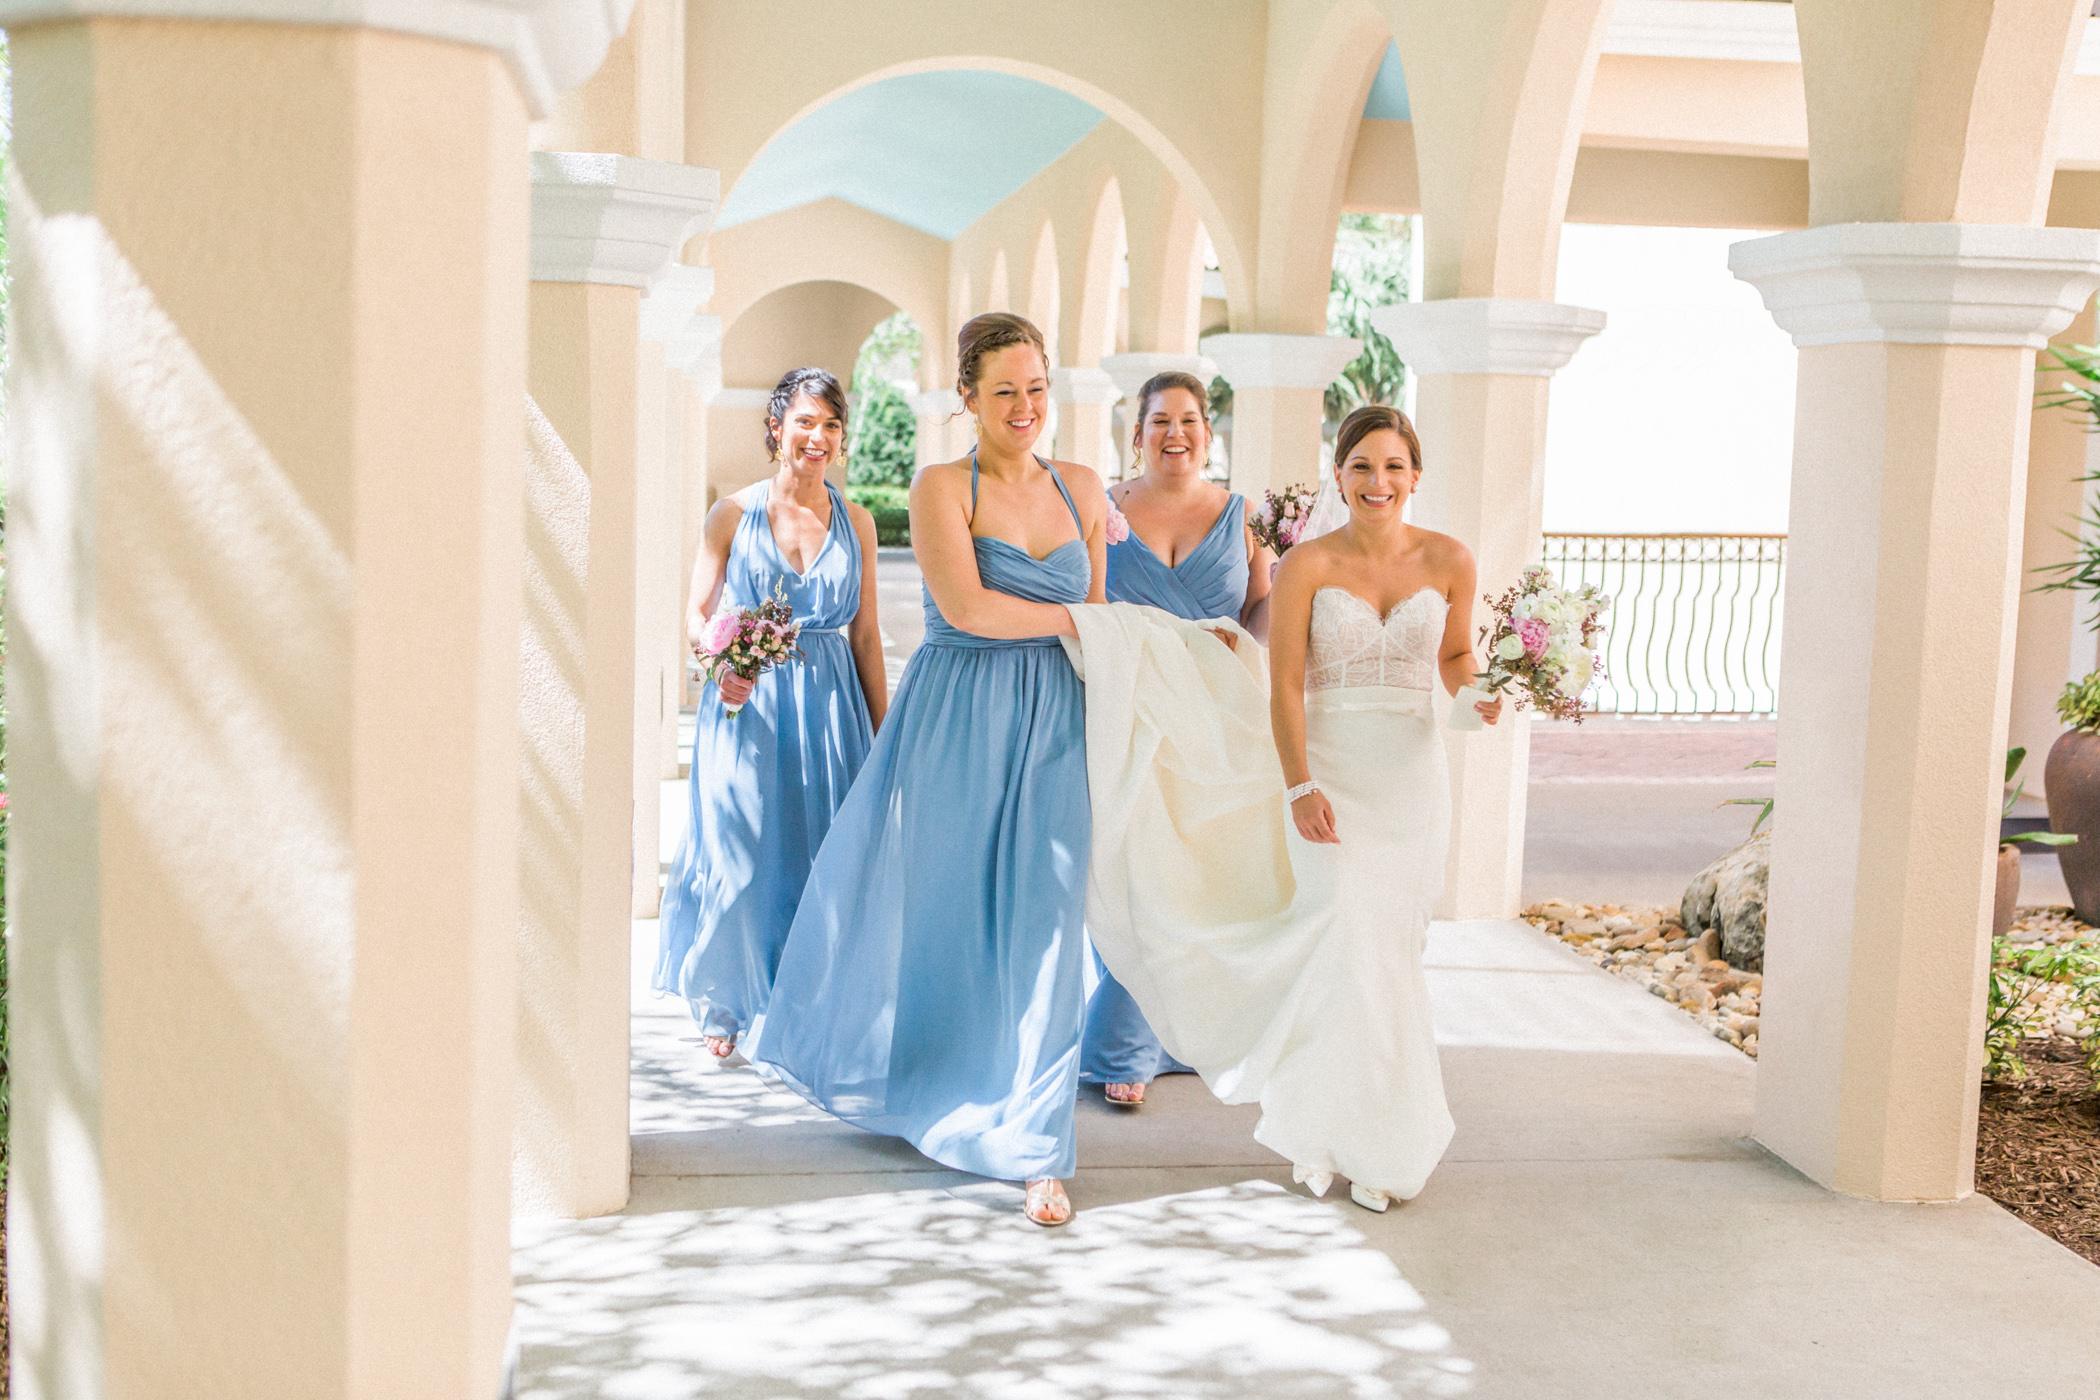 David & Allie - Shingle Creek Wedding Sneak Peek Spring 2016 - Web 6.jpg